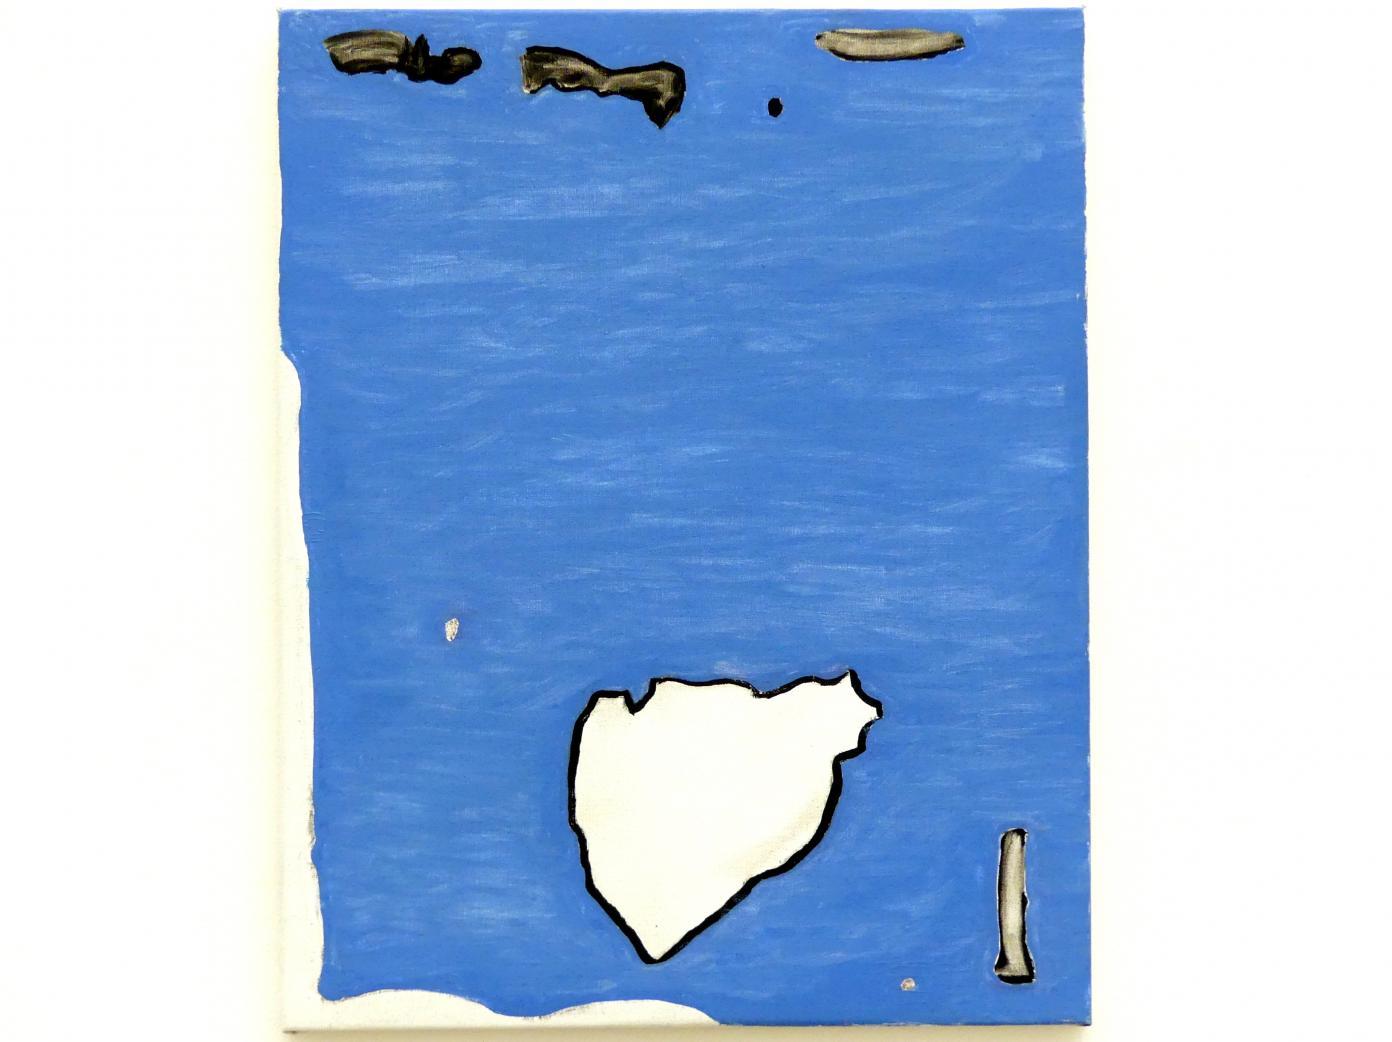 Raoul De Keyser: Blue Note, 2006